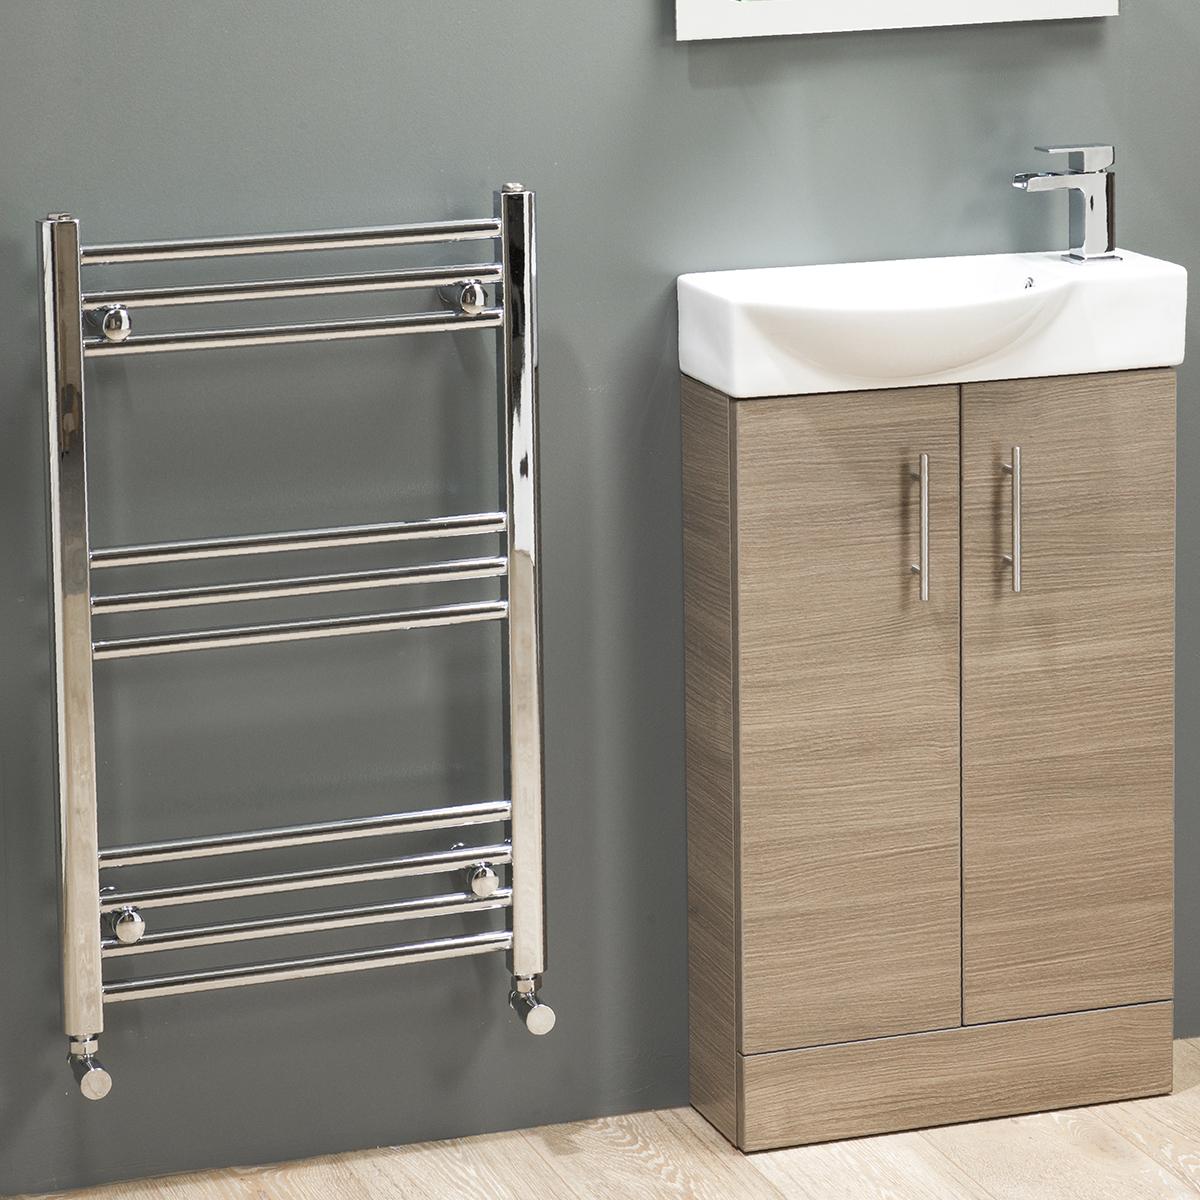 500 slimline vanity basin sink unit cloakroom bathroom. Black Bedroom Furniture Sets. Home Design Ideas